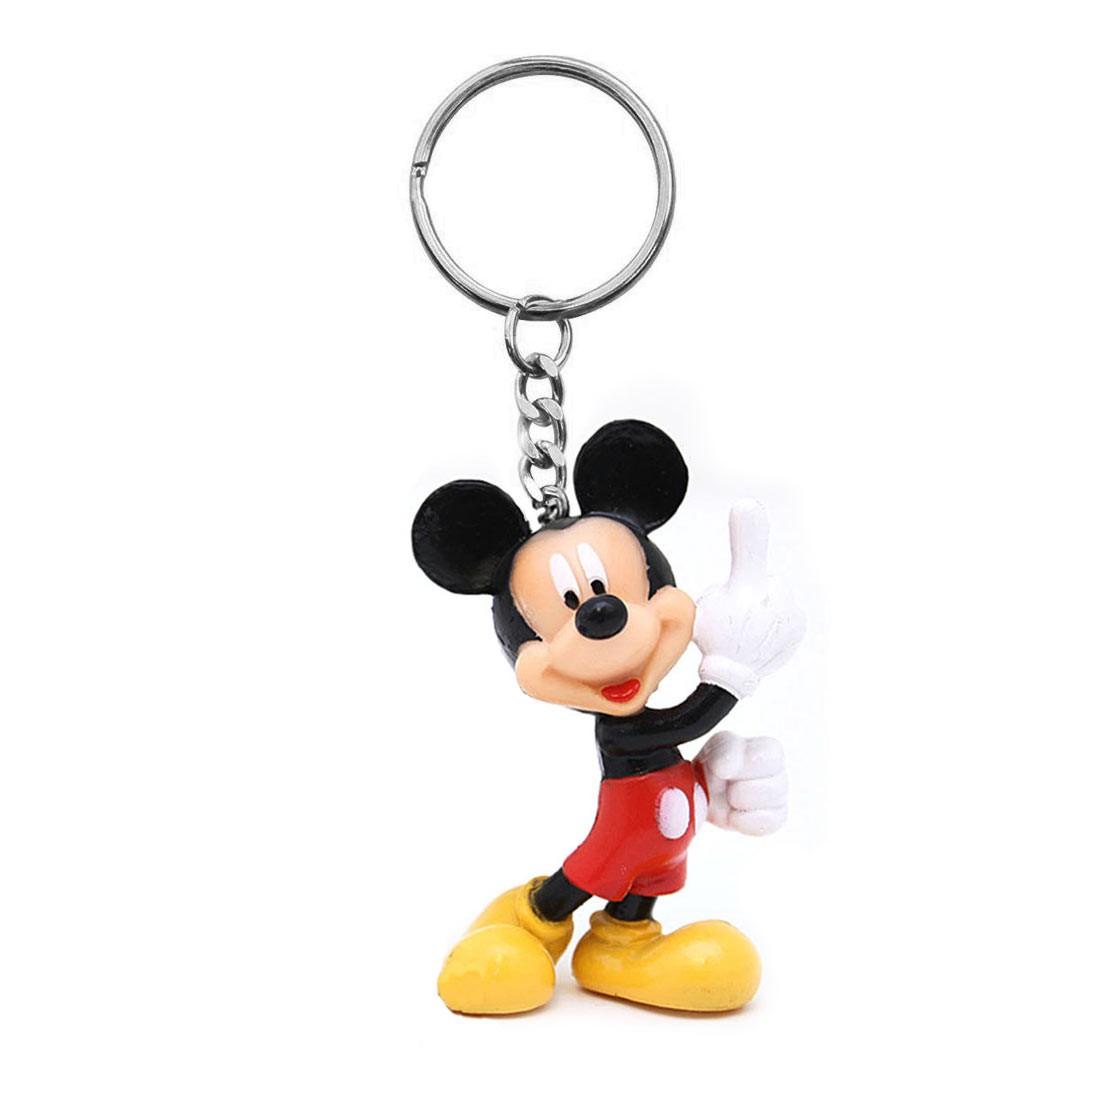 Disney Mickey Mouse Plastic Keychain